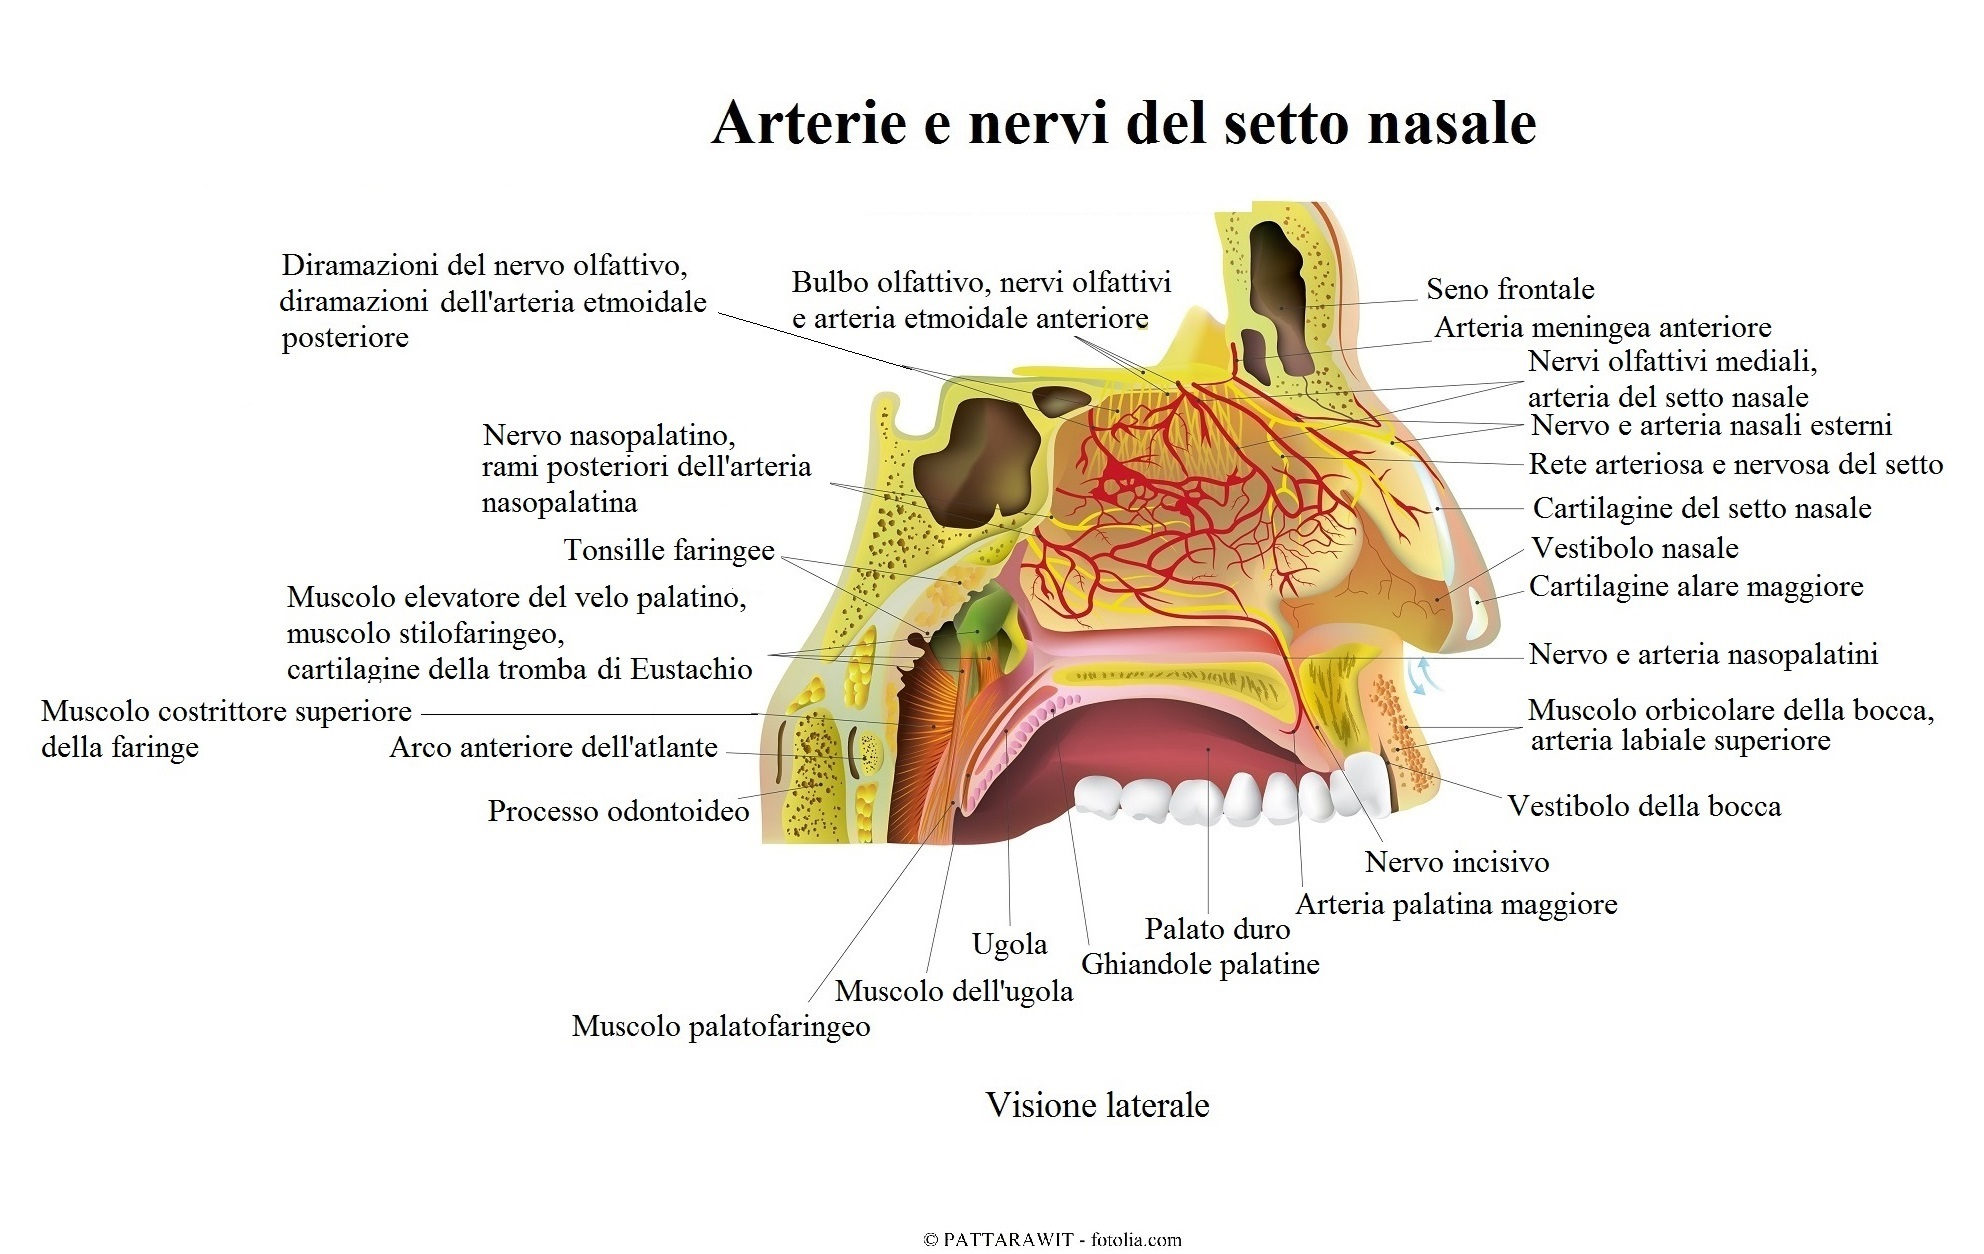 setto-nasle-Arterie-nervi